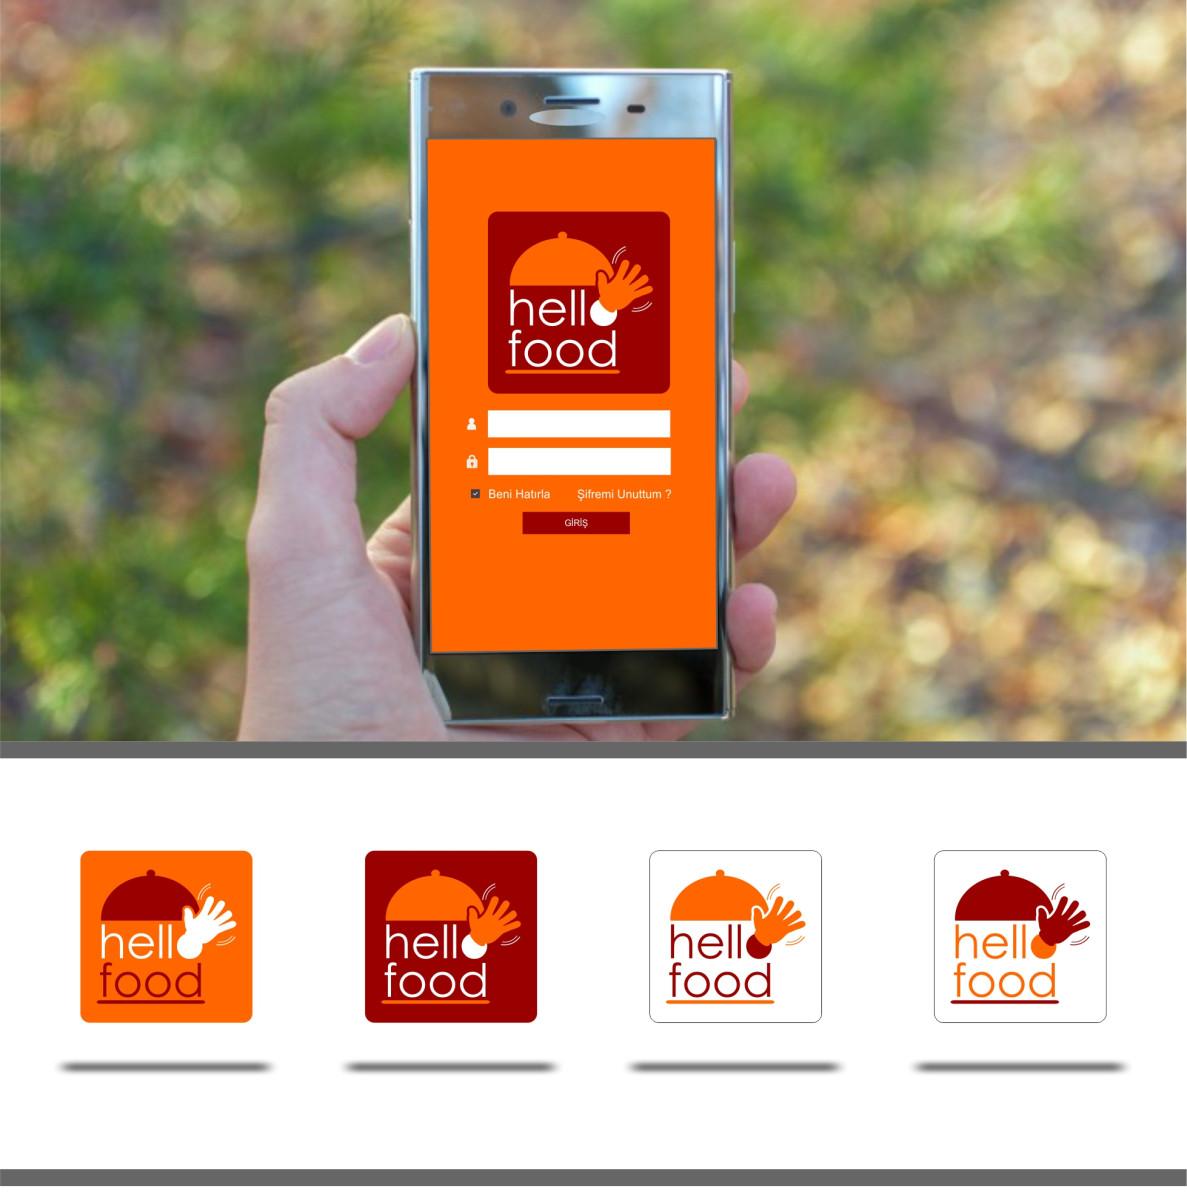 Tasarlayan Logo Runlog-Hello Food uygulamasına logo